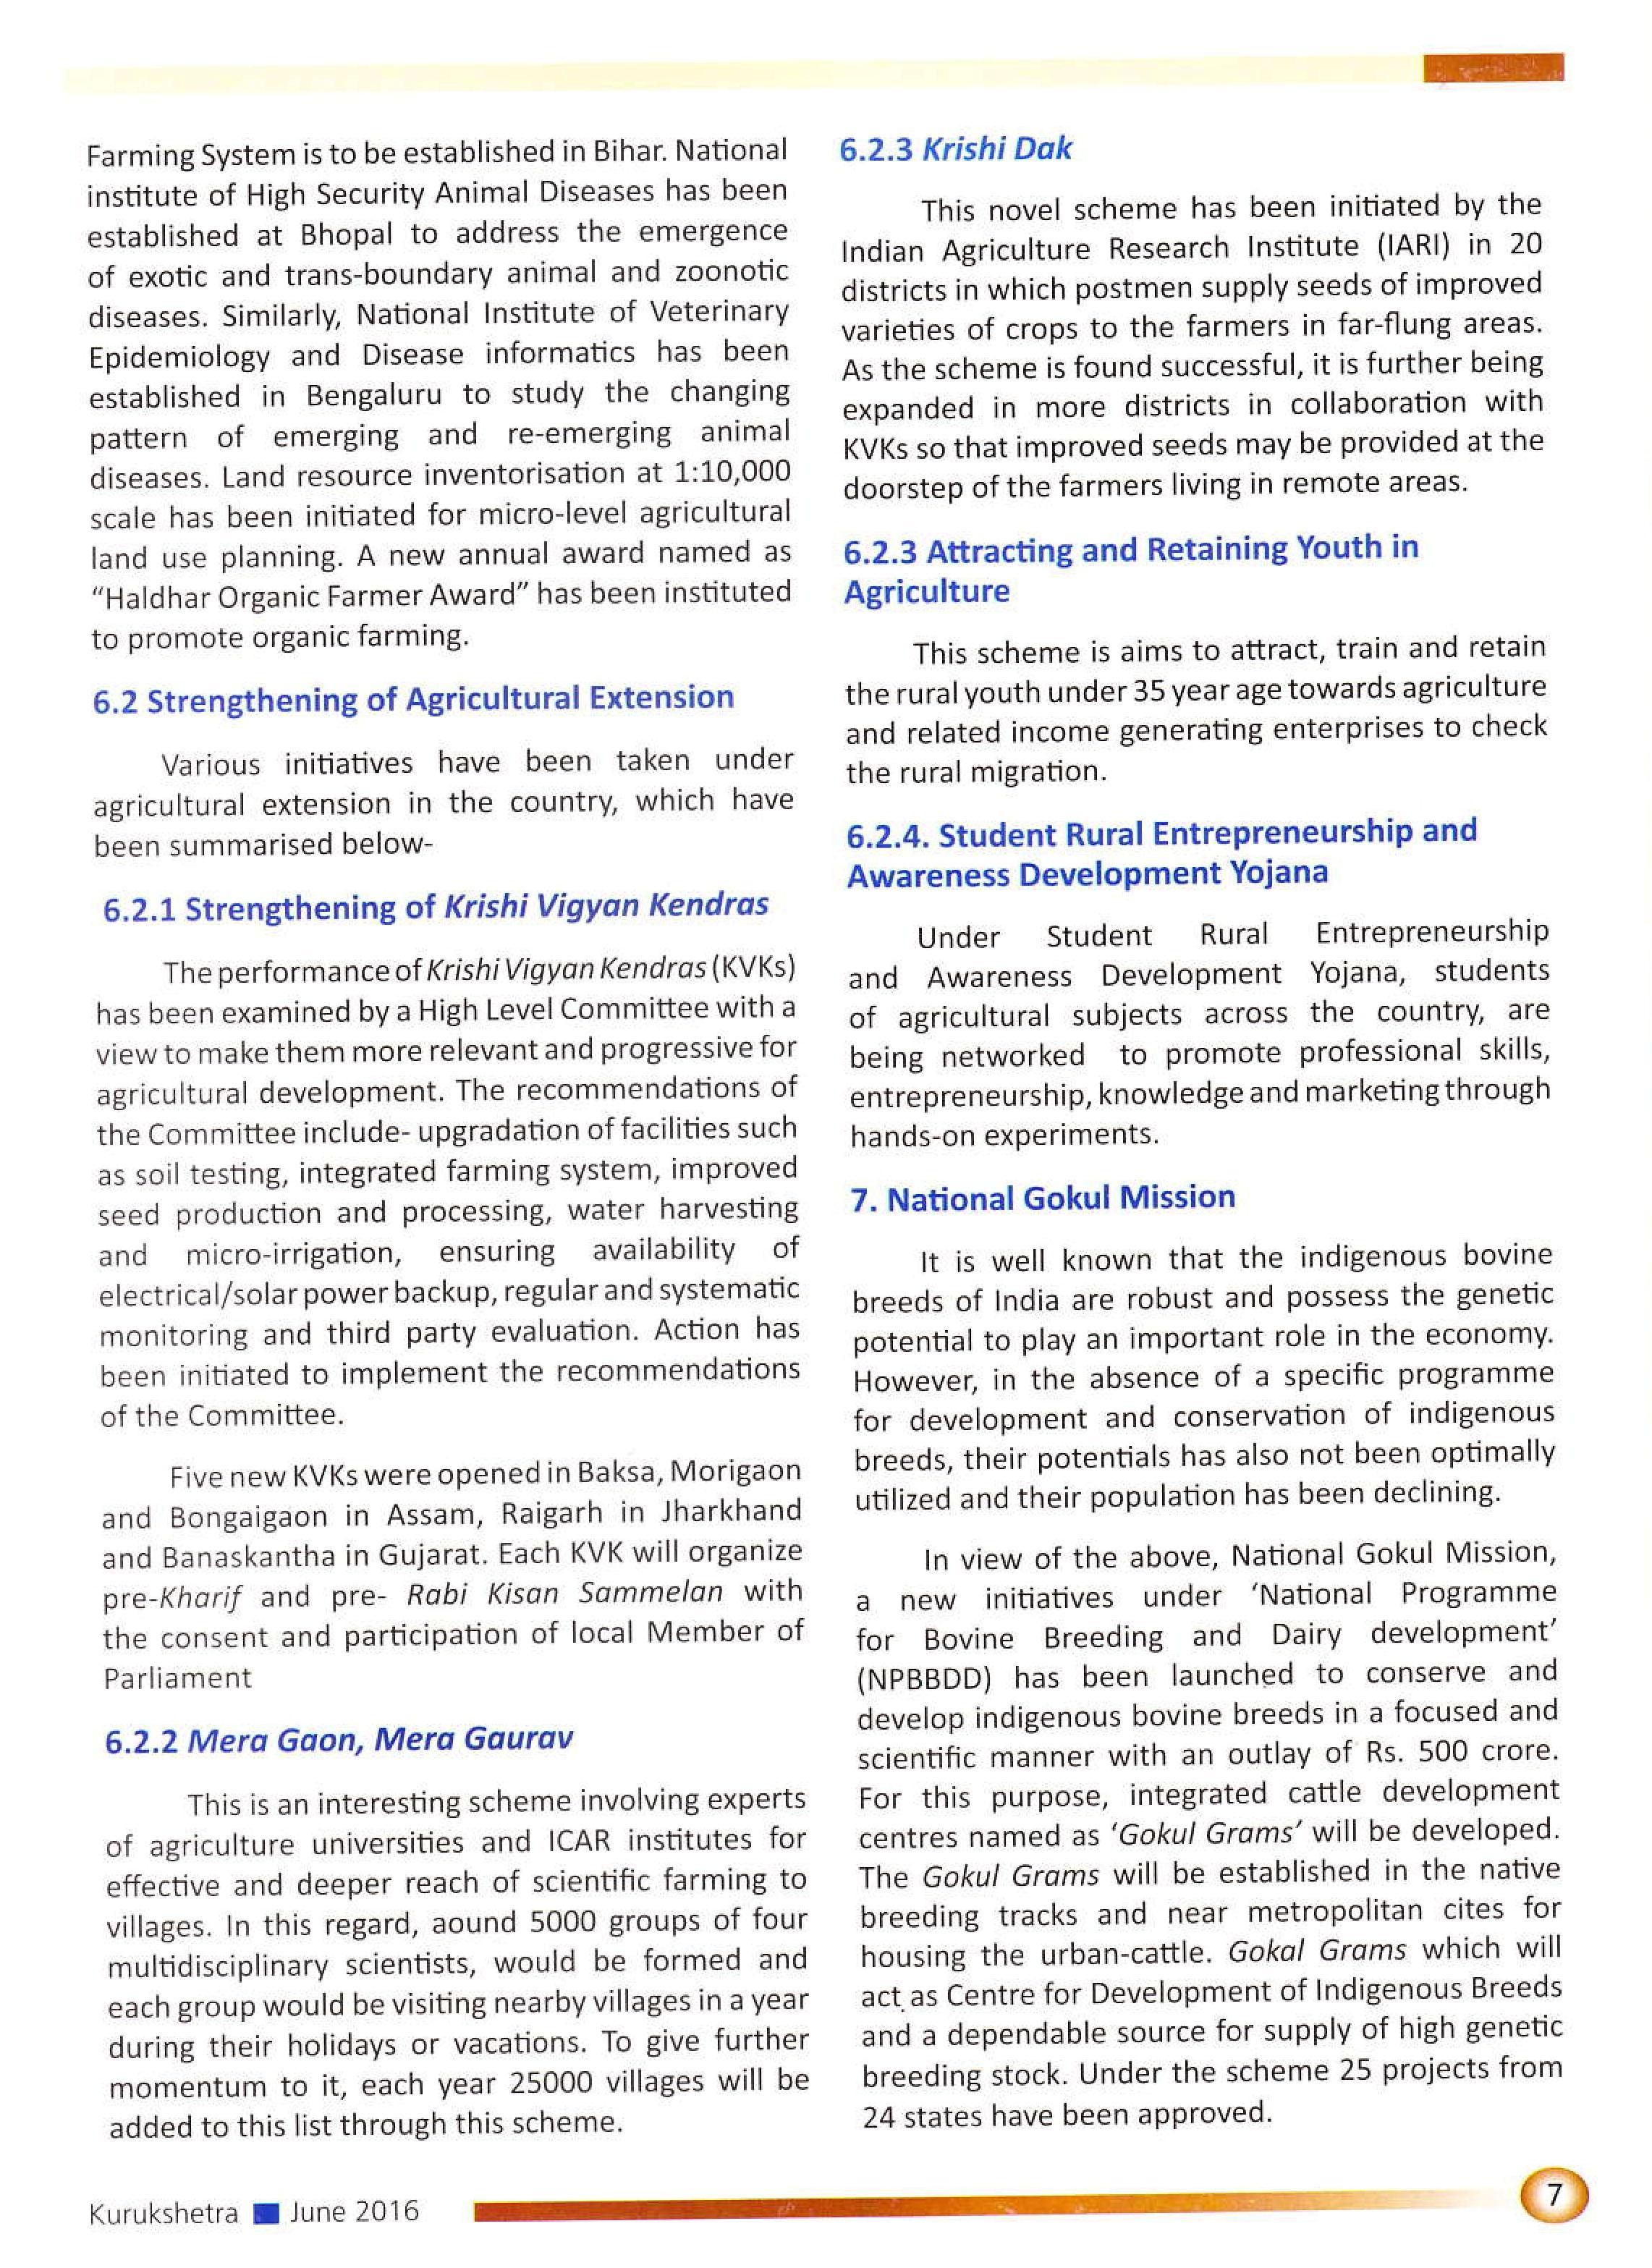 kurukshetra english-page-003